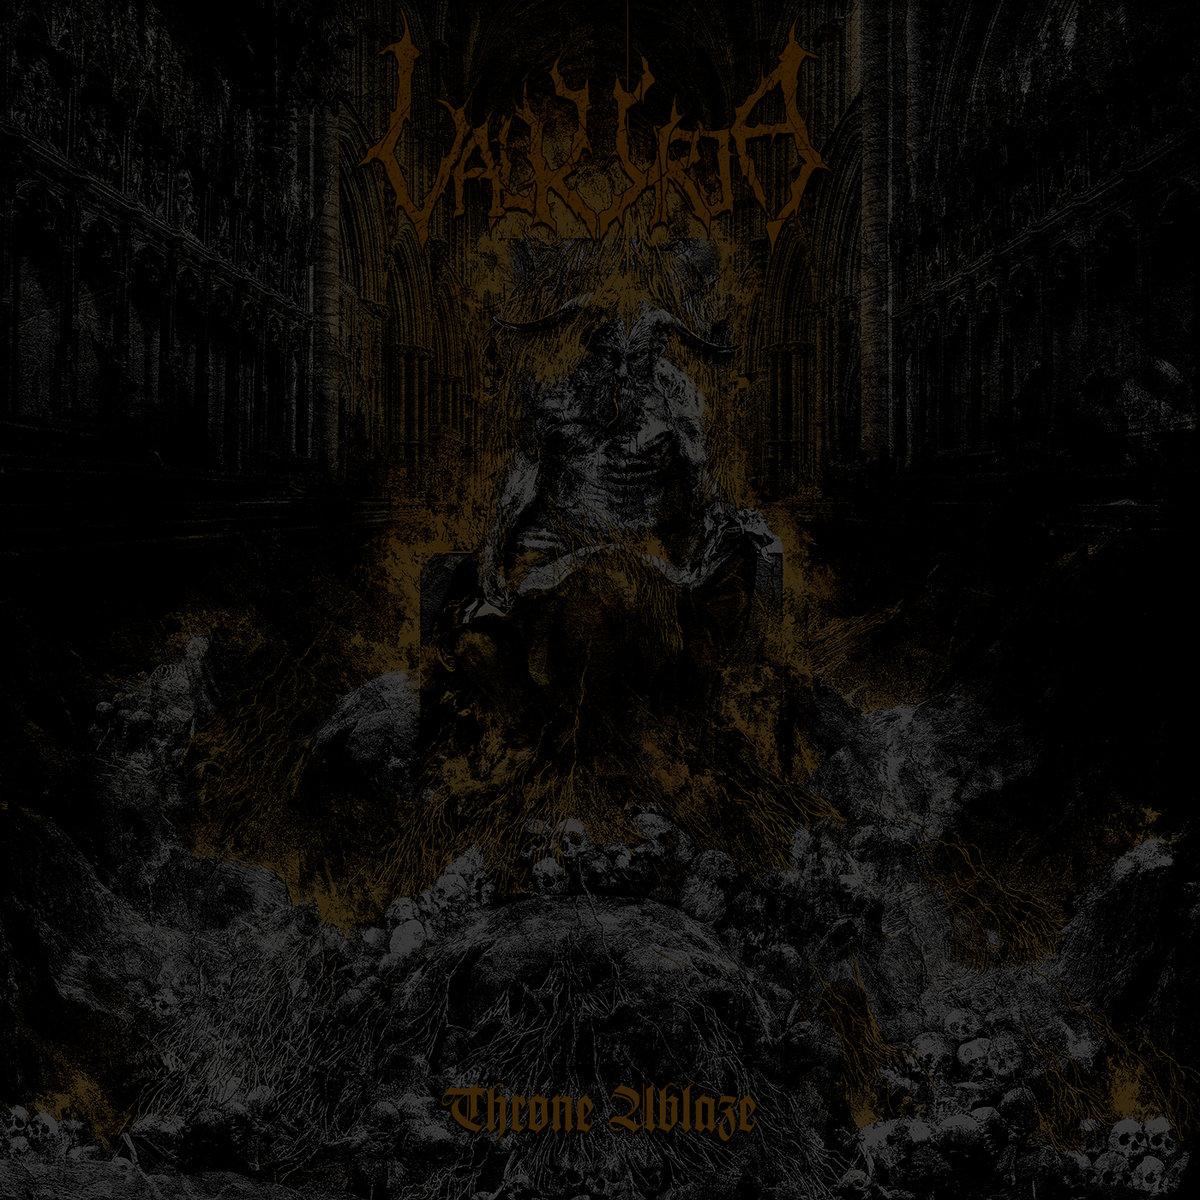 Throne Ablaze | W.T.C. Product...